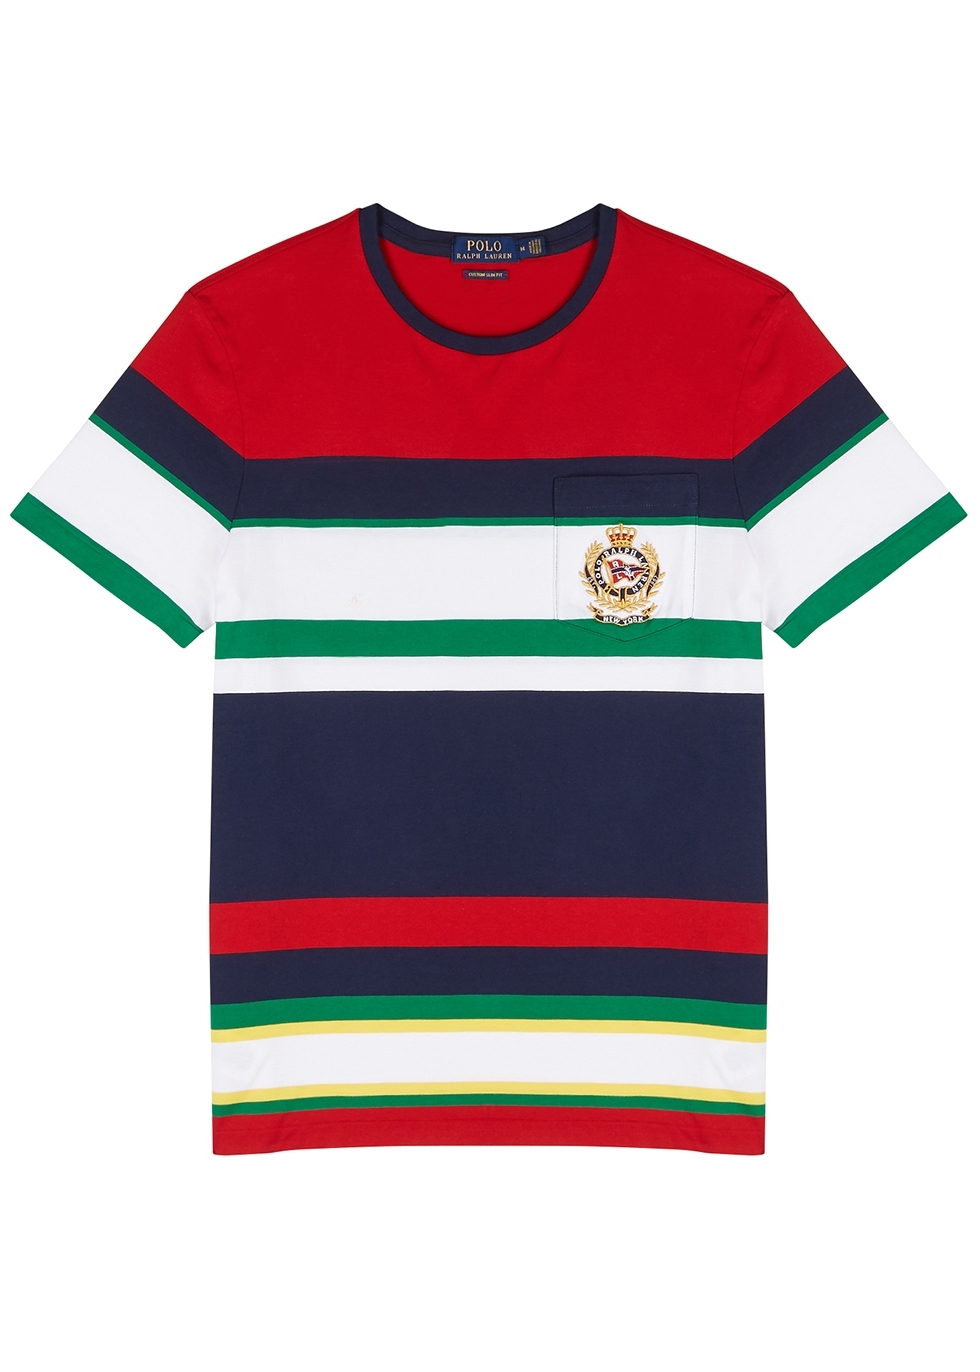 78c52bb019c8f Polo Ralph Lauren Polo Shirts